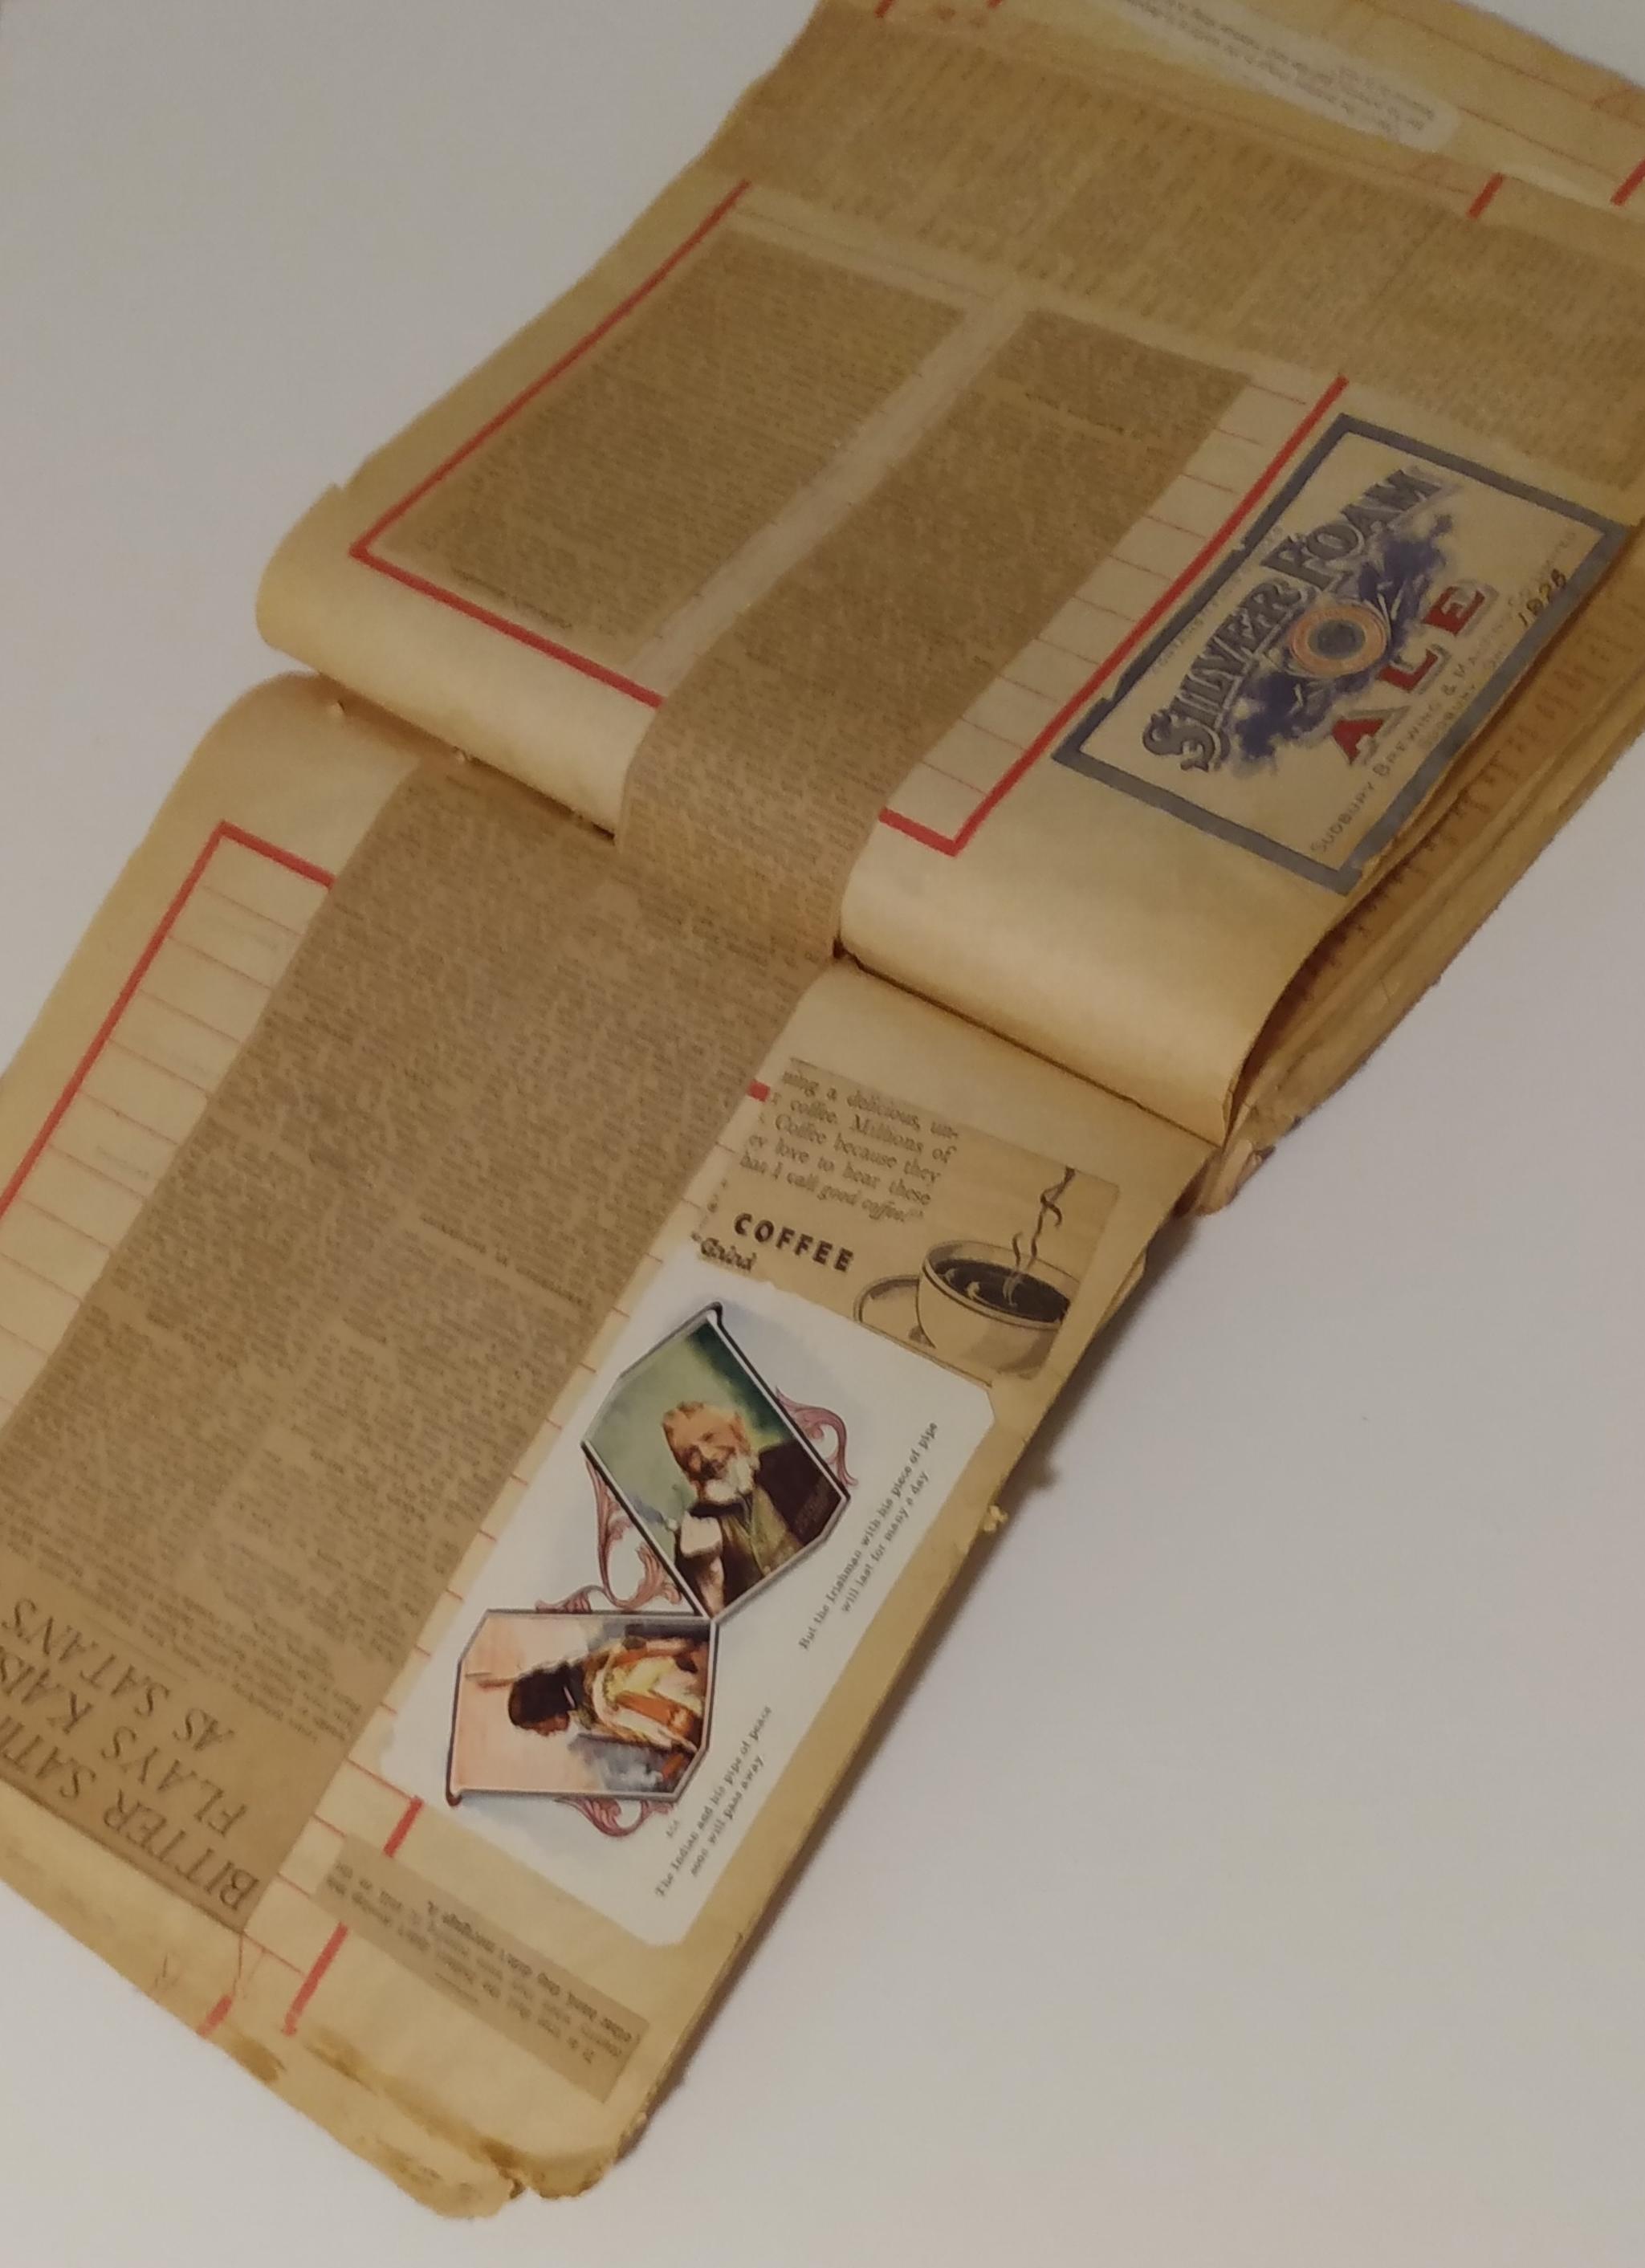 Clipbook inside 1